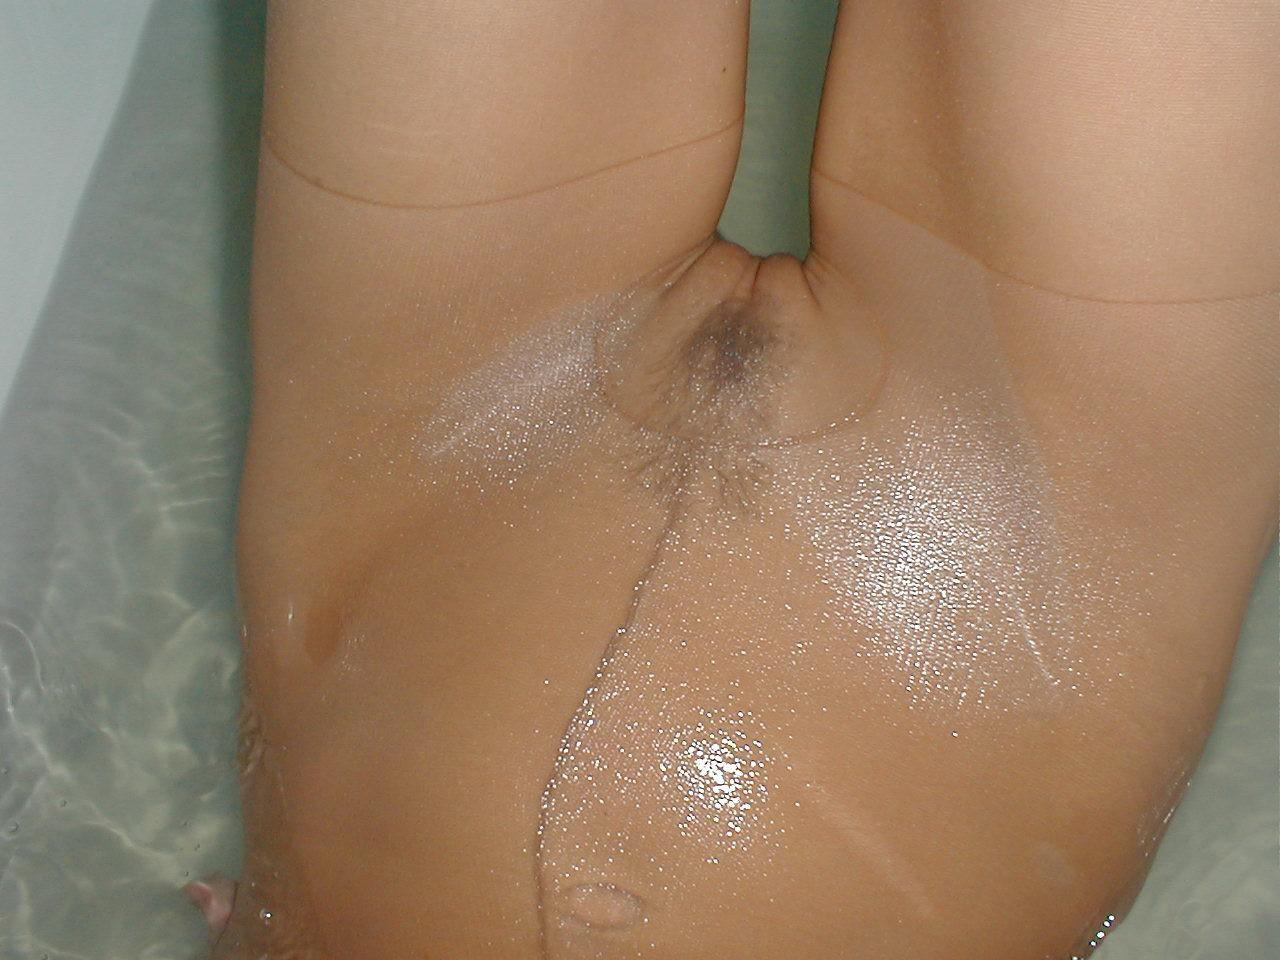 http://pbs-2.adult-empire.com/85/8570/005/pic/2.jpg